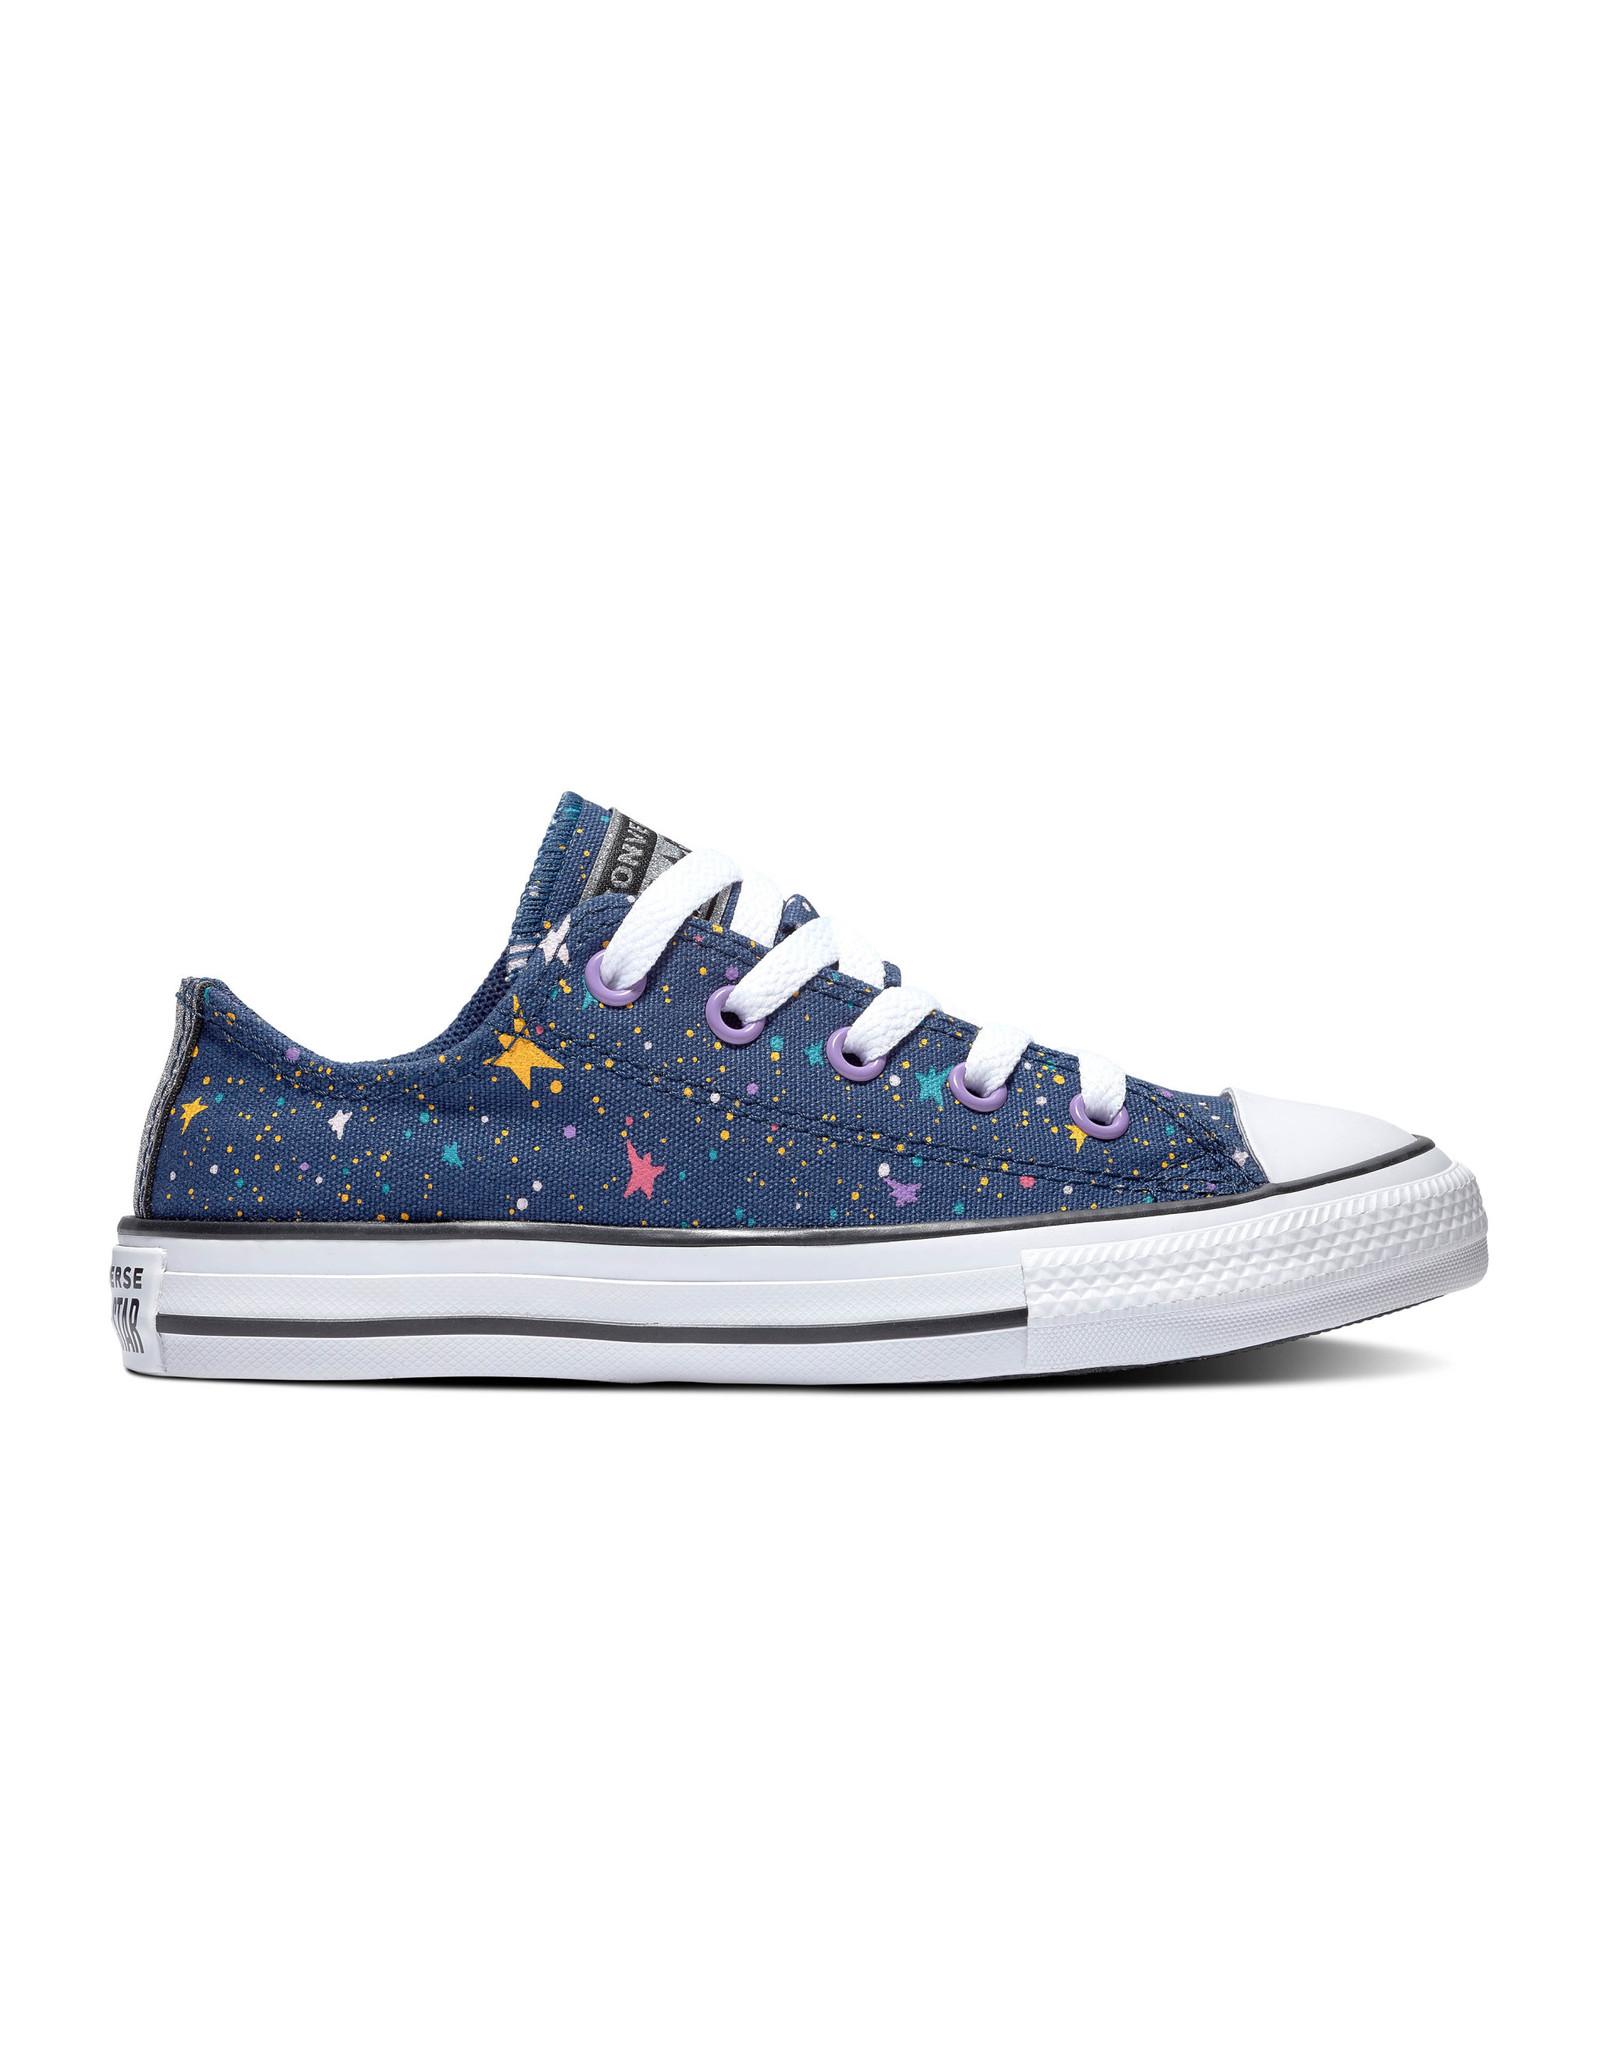 CONVERSE CHUCK TAYLOR ALL STAR OX NAVY/MOD PINK/WHITE CZMON-665114C